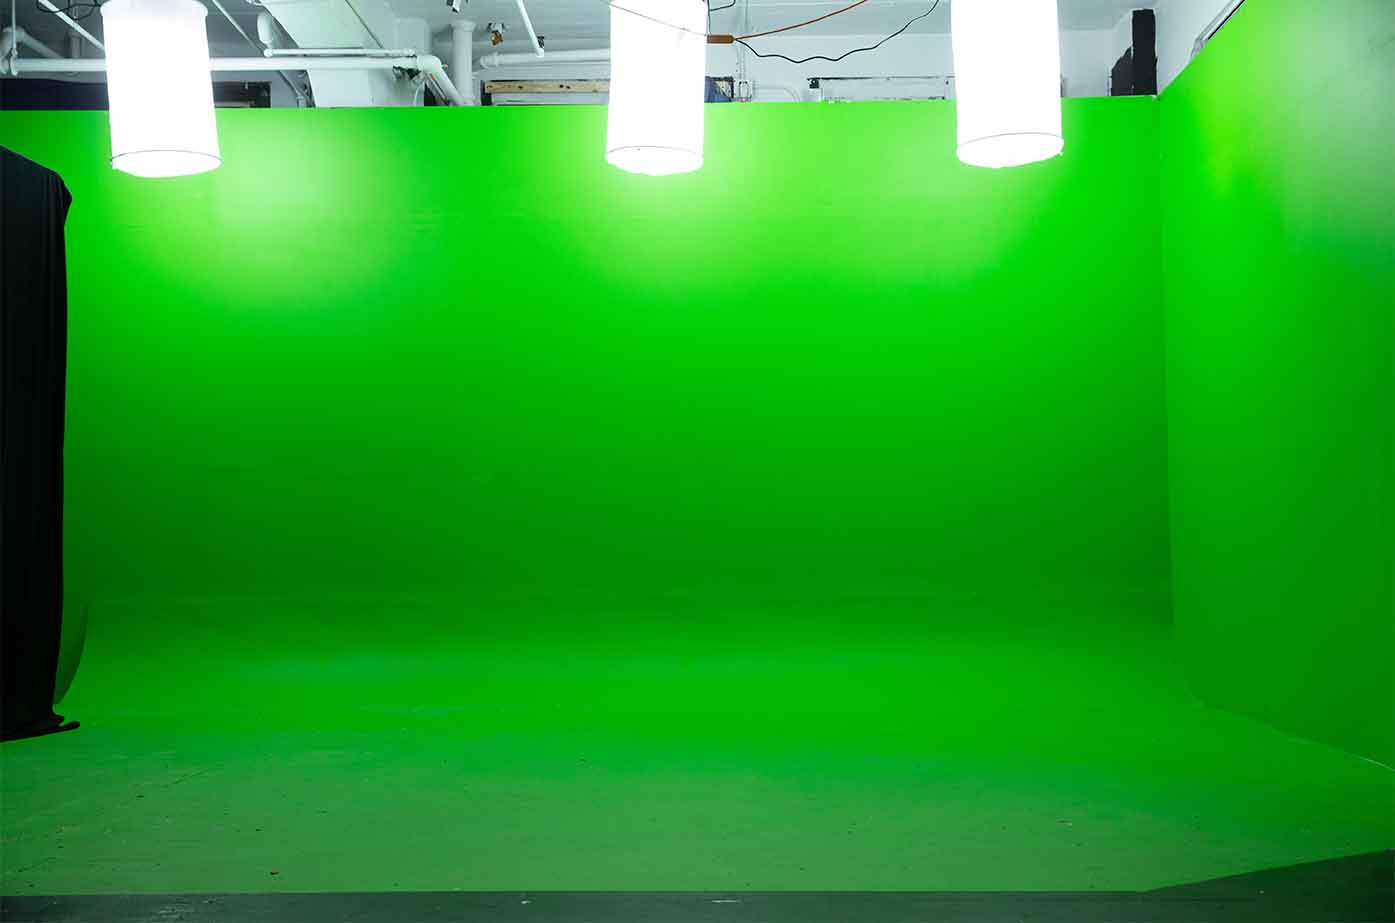 Midtown Green screen Studio green cyc stage